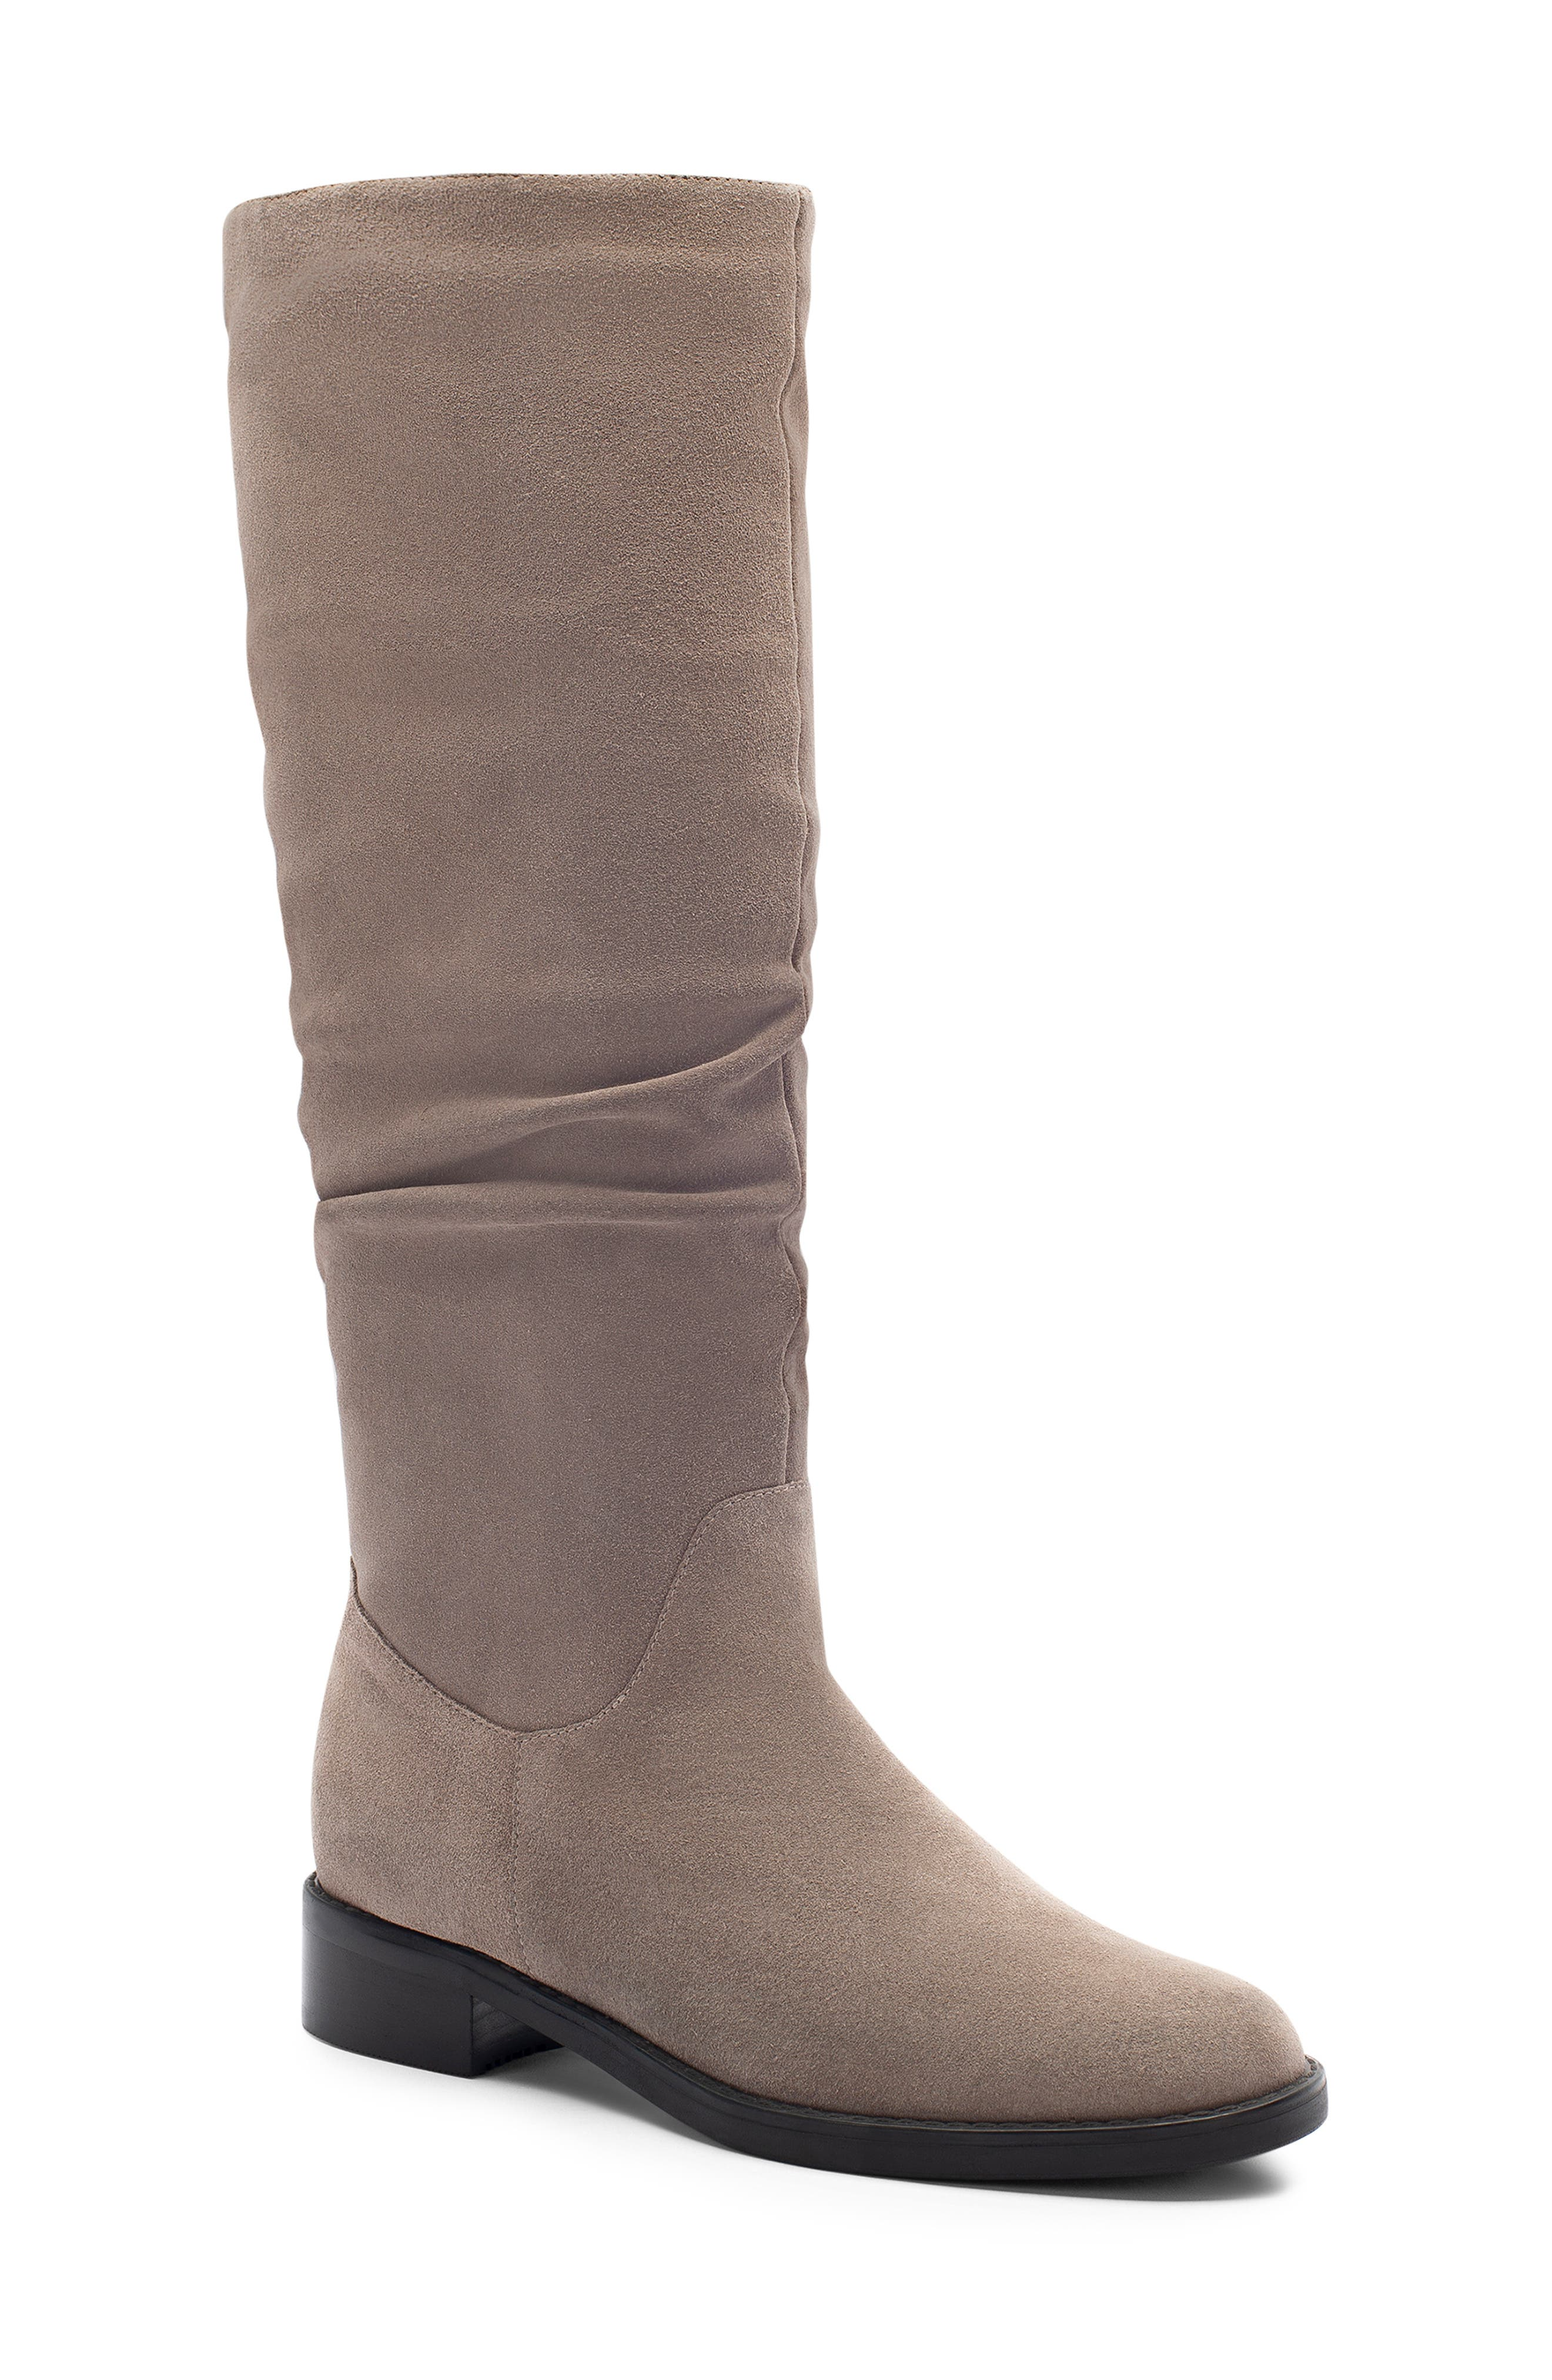 Blondo Erika Waterproof Knee High Boot- Grey